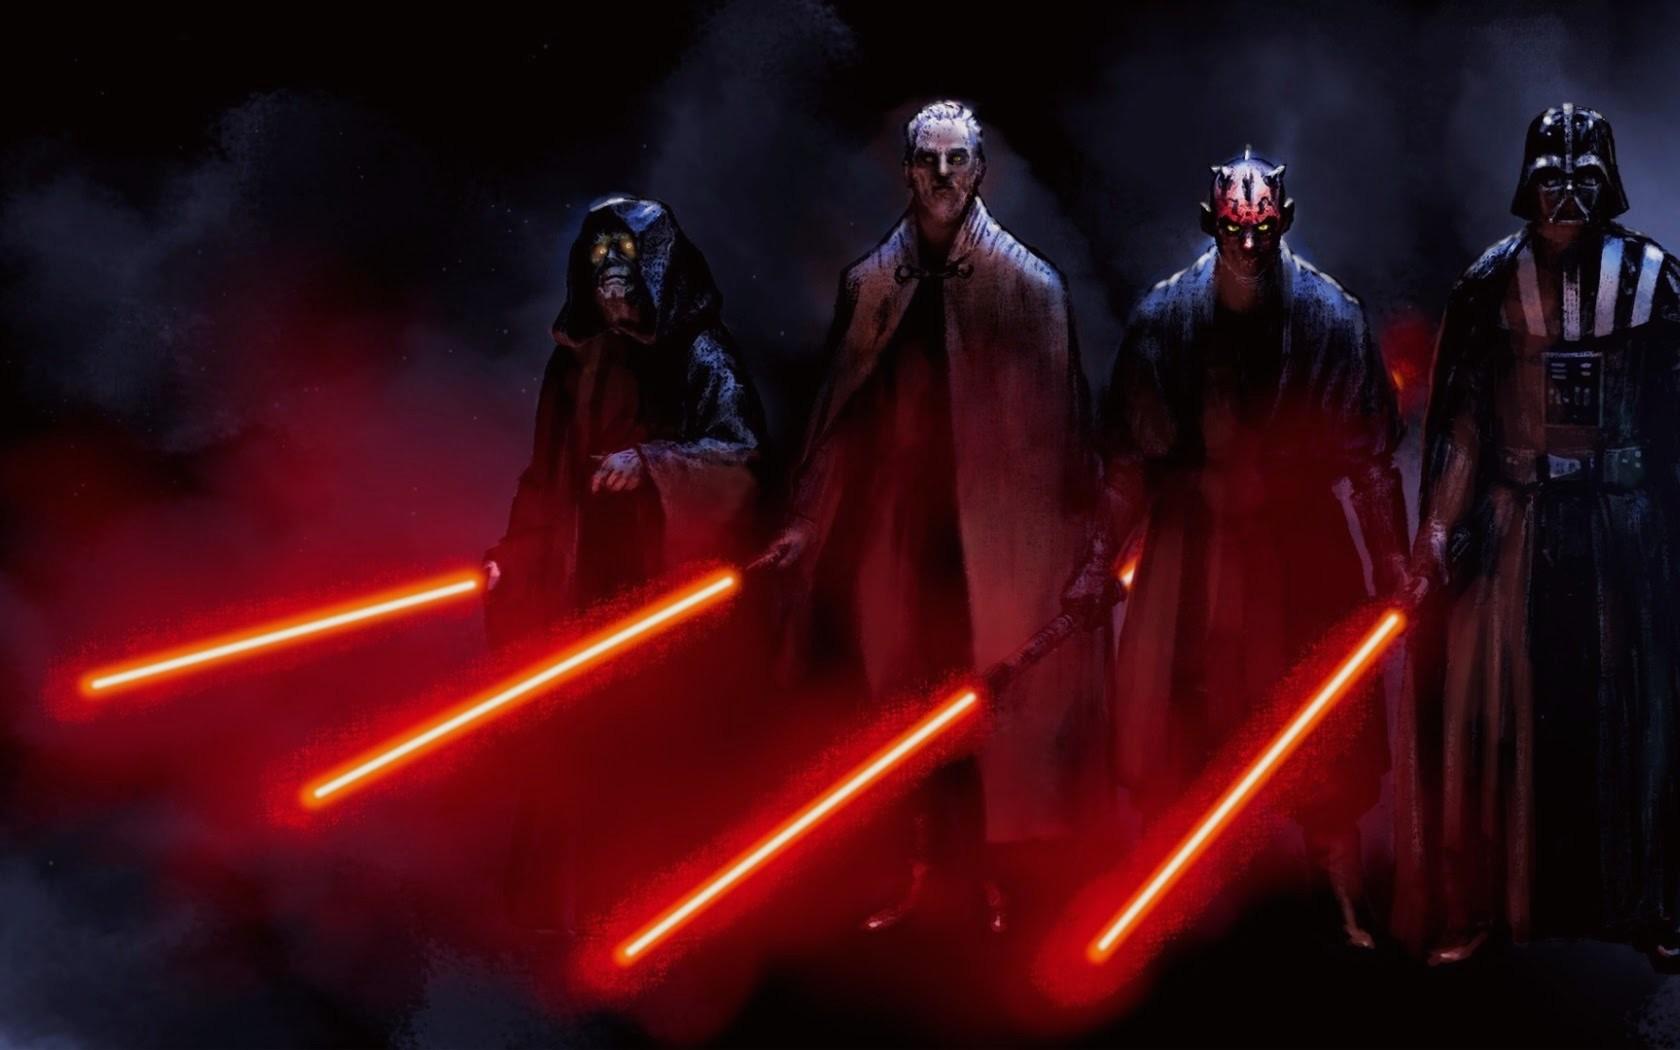 Star Wars Episode 7 wallpapers for desktop 1680x1050